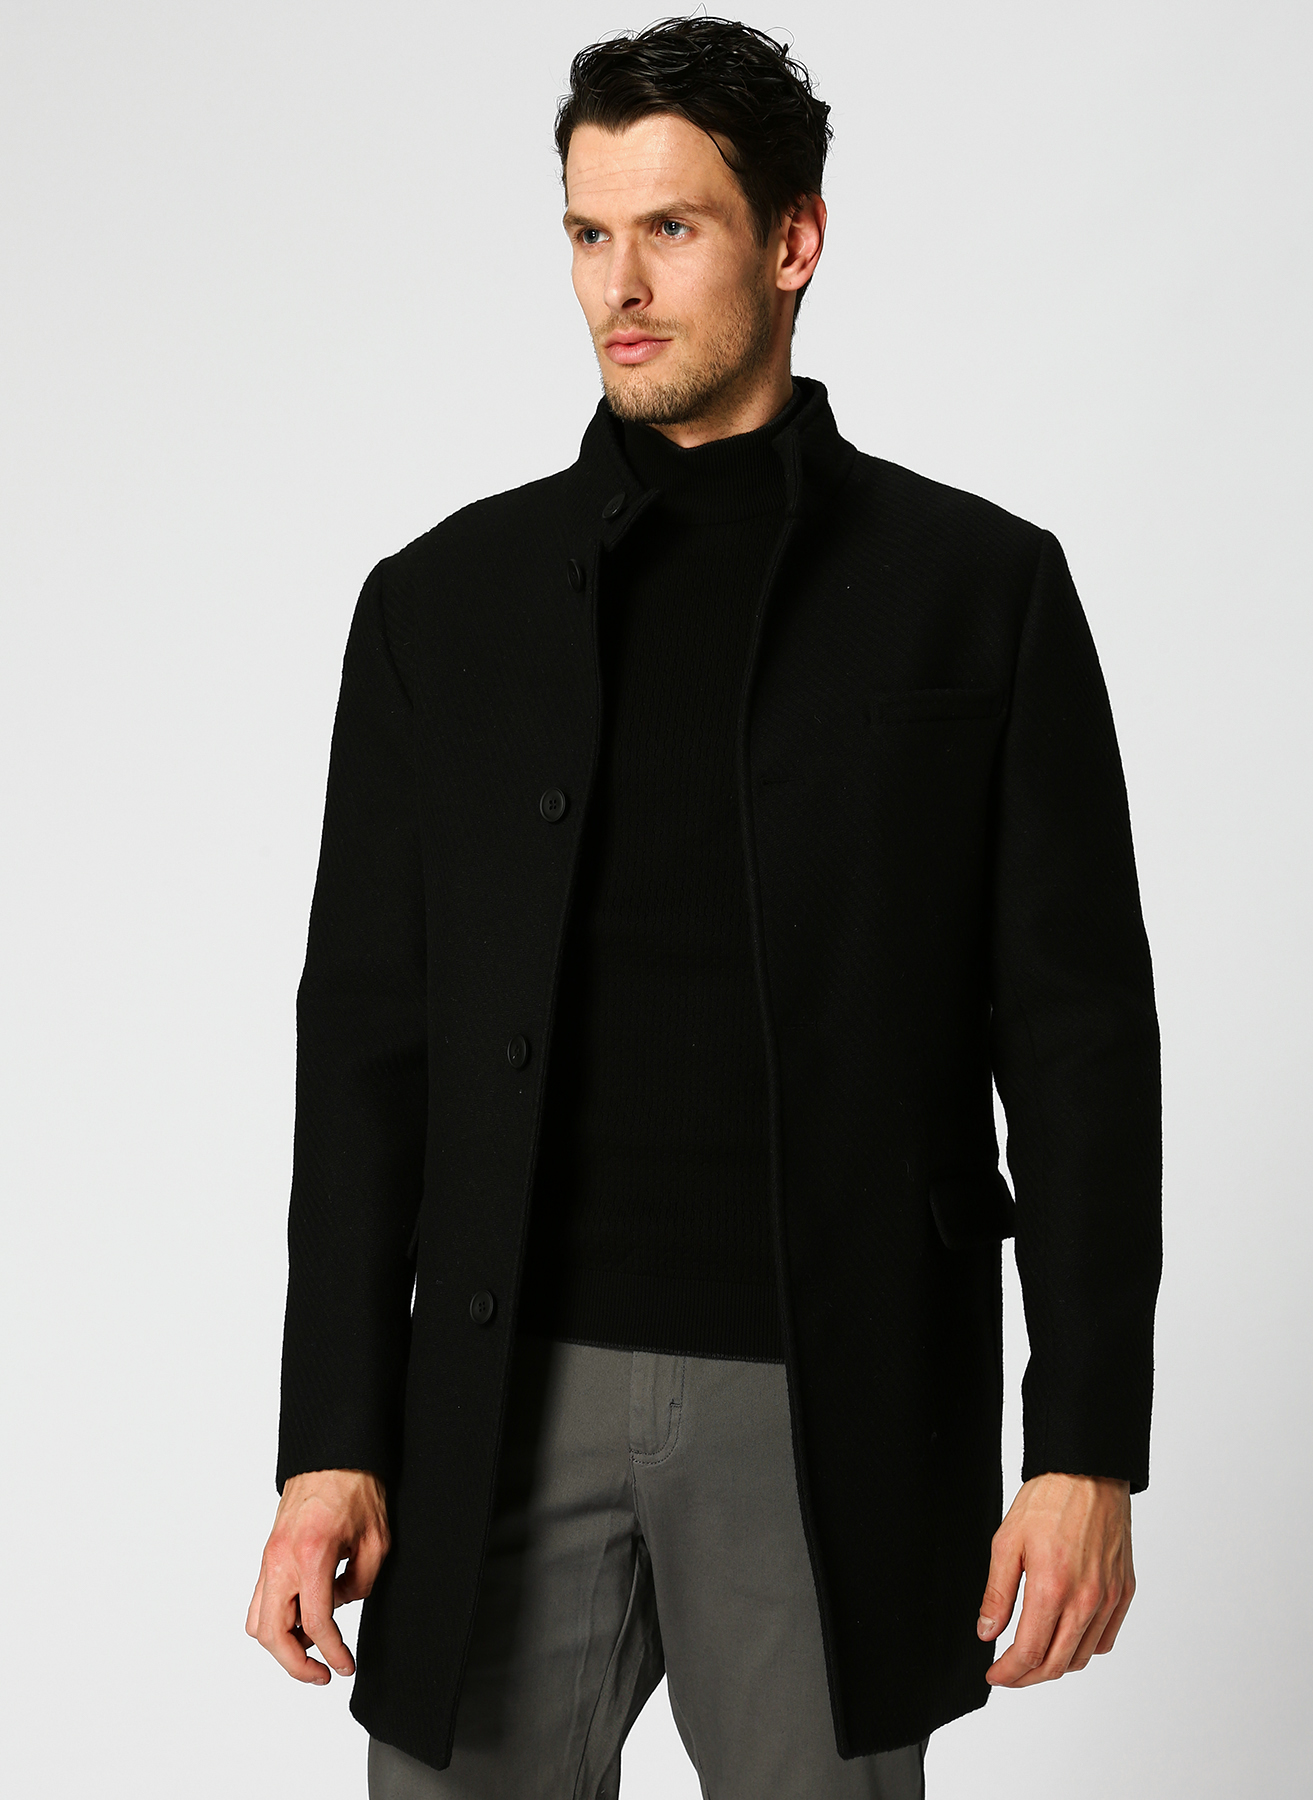 George Hogg Hakim Yaka Çizgili Siyah Palto 48 5001699412002 Ürün Resmi